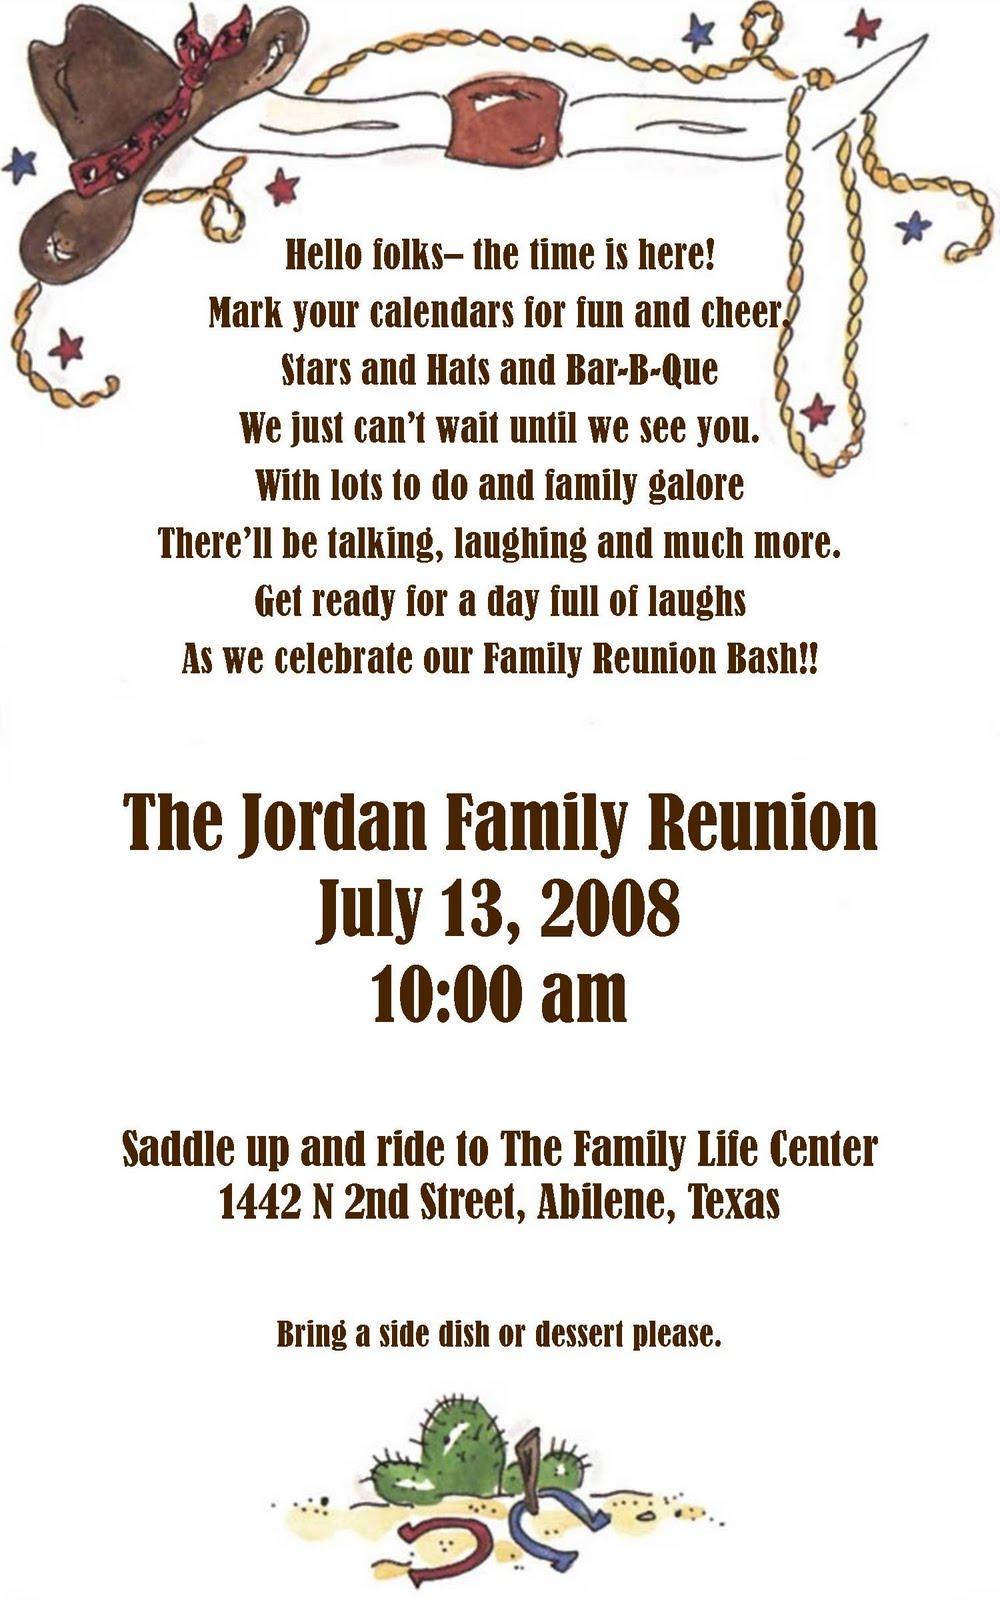 Ideas For Family Reunion Invitations as awesome invitation ideas